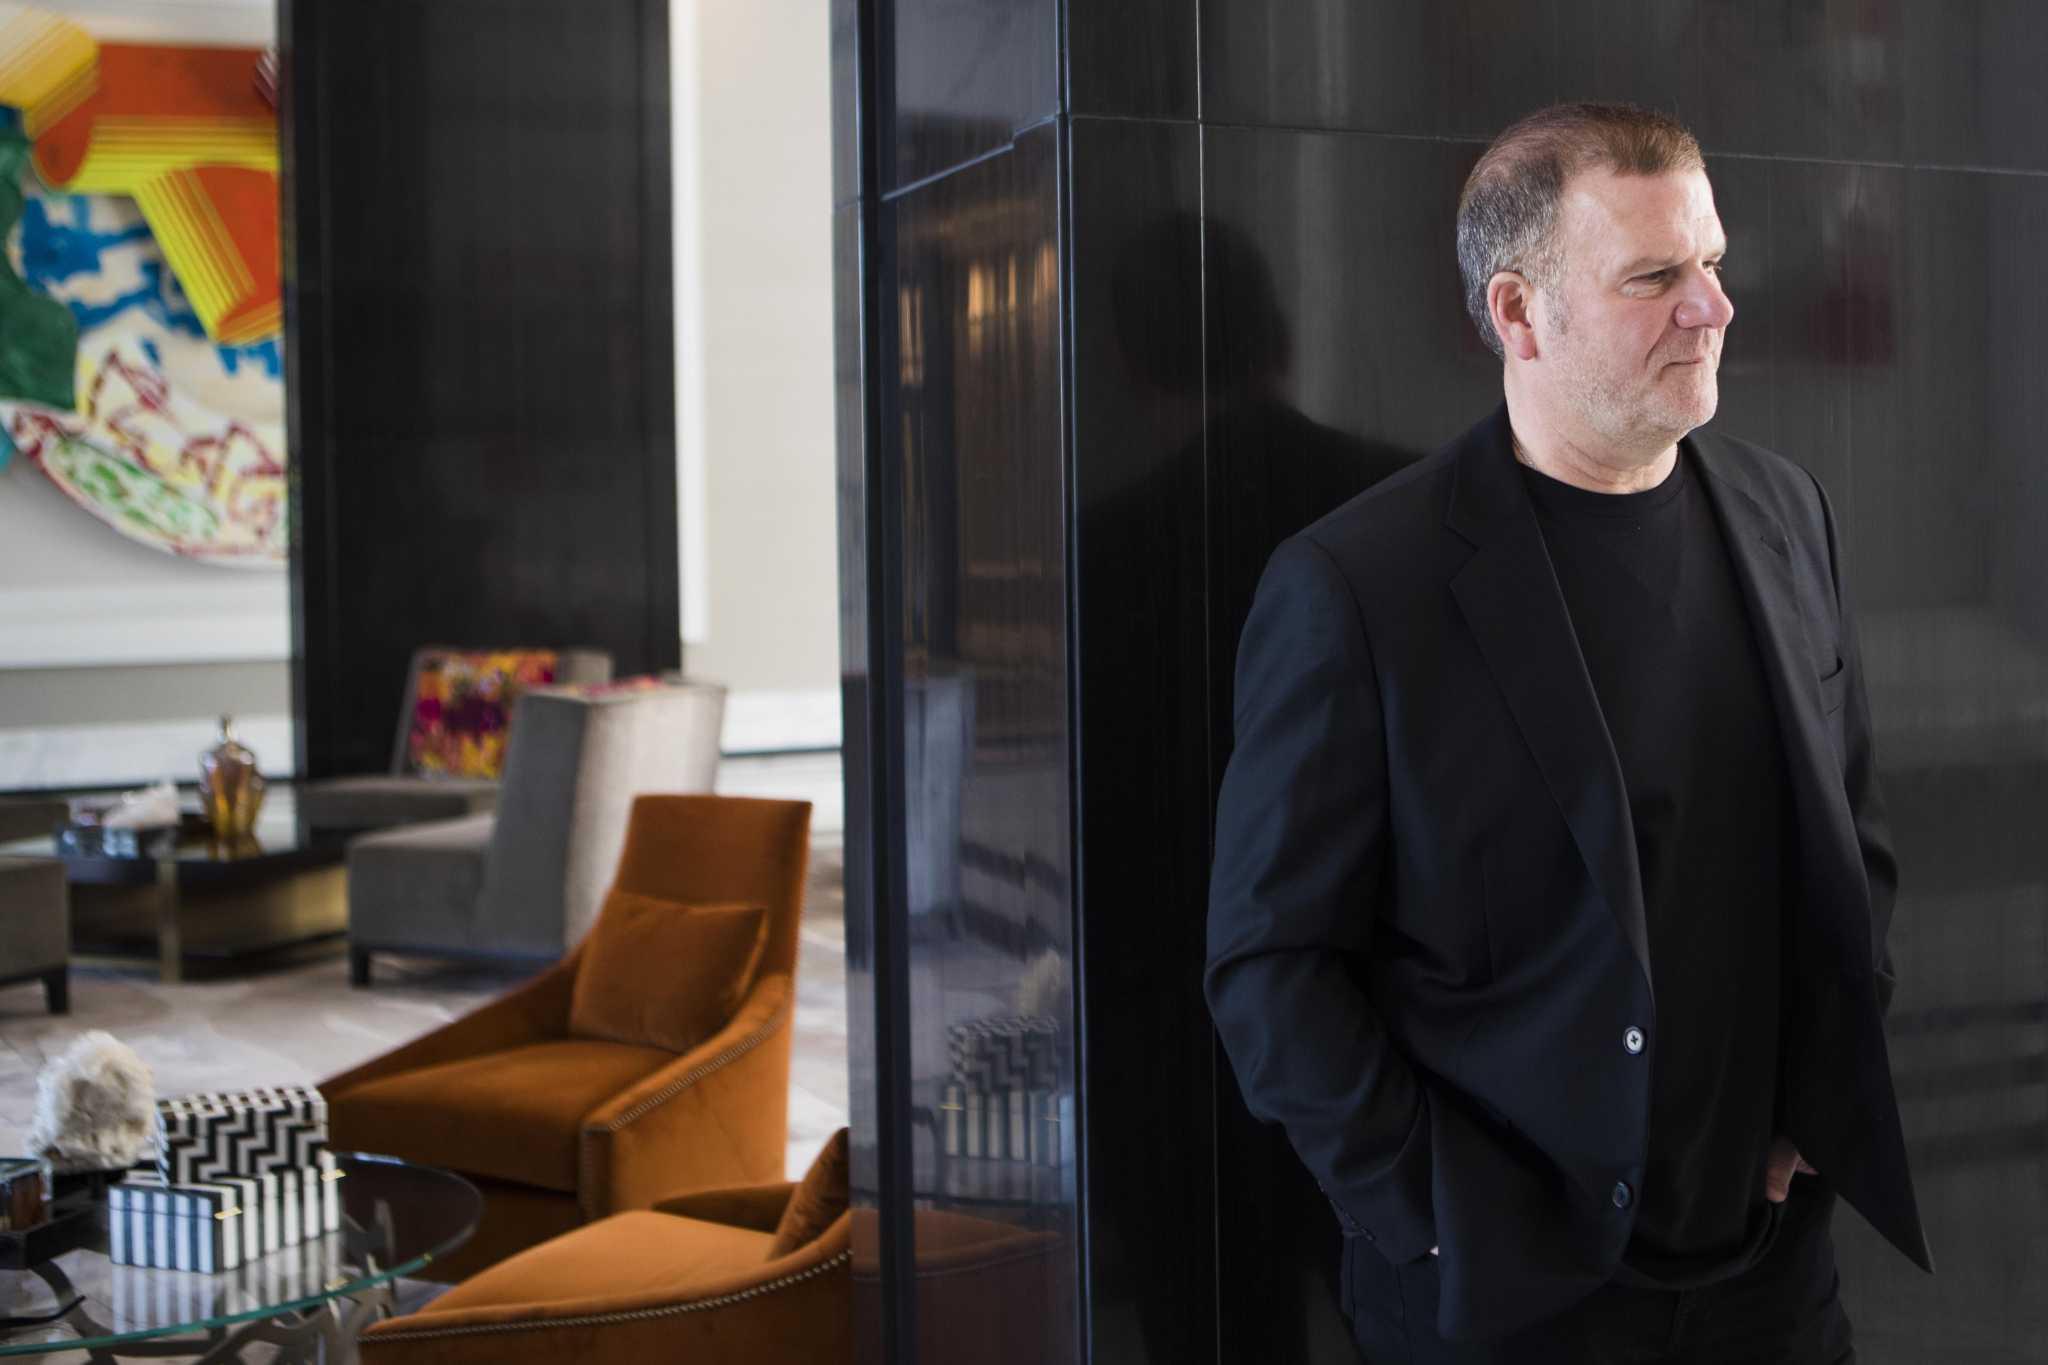 Tilman Fertitta's luxury car dealership now accepts Bitcoin